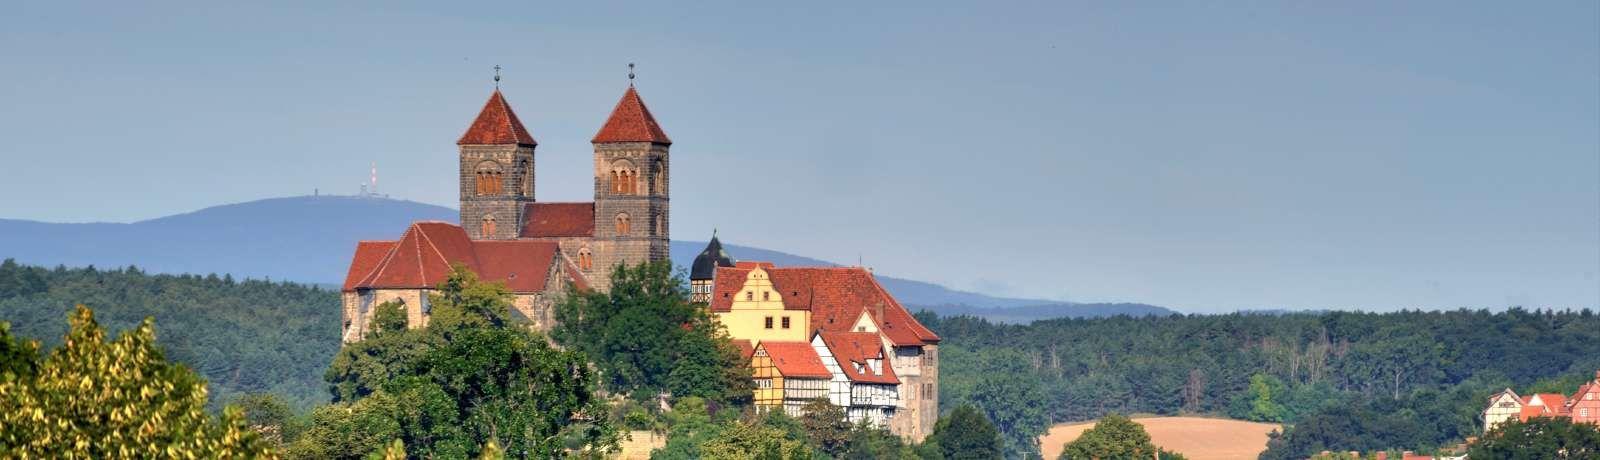 Welterbestadt Quedlinburg Quedlinburg, Stadt, Welt